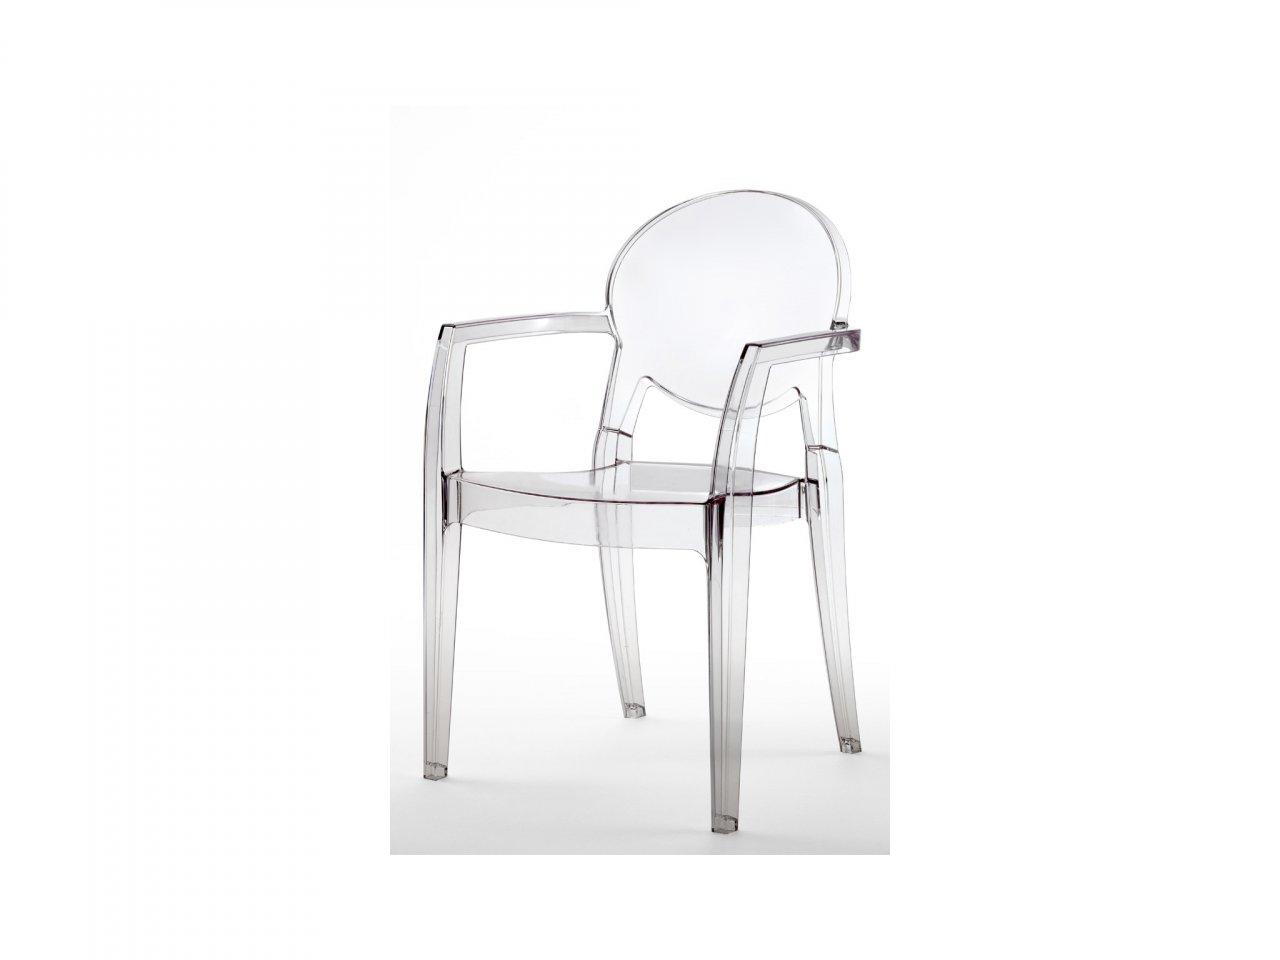 Sedia Con Braccioli Igloo - v2